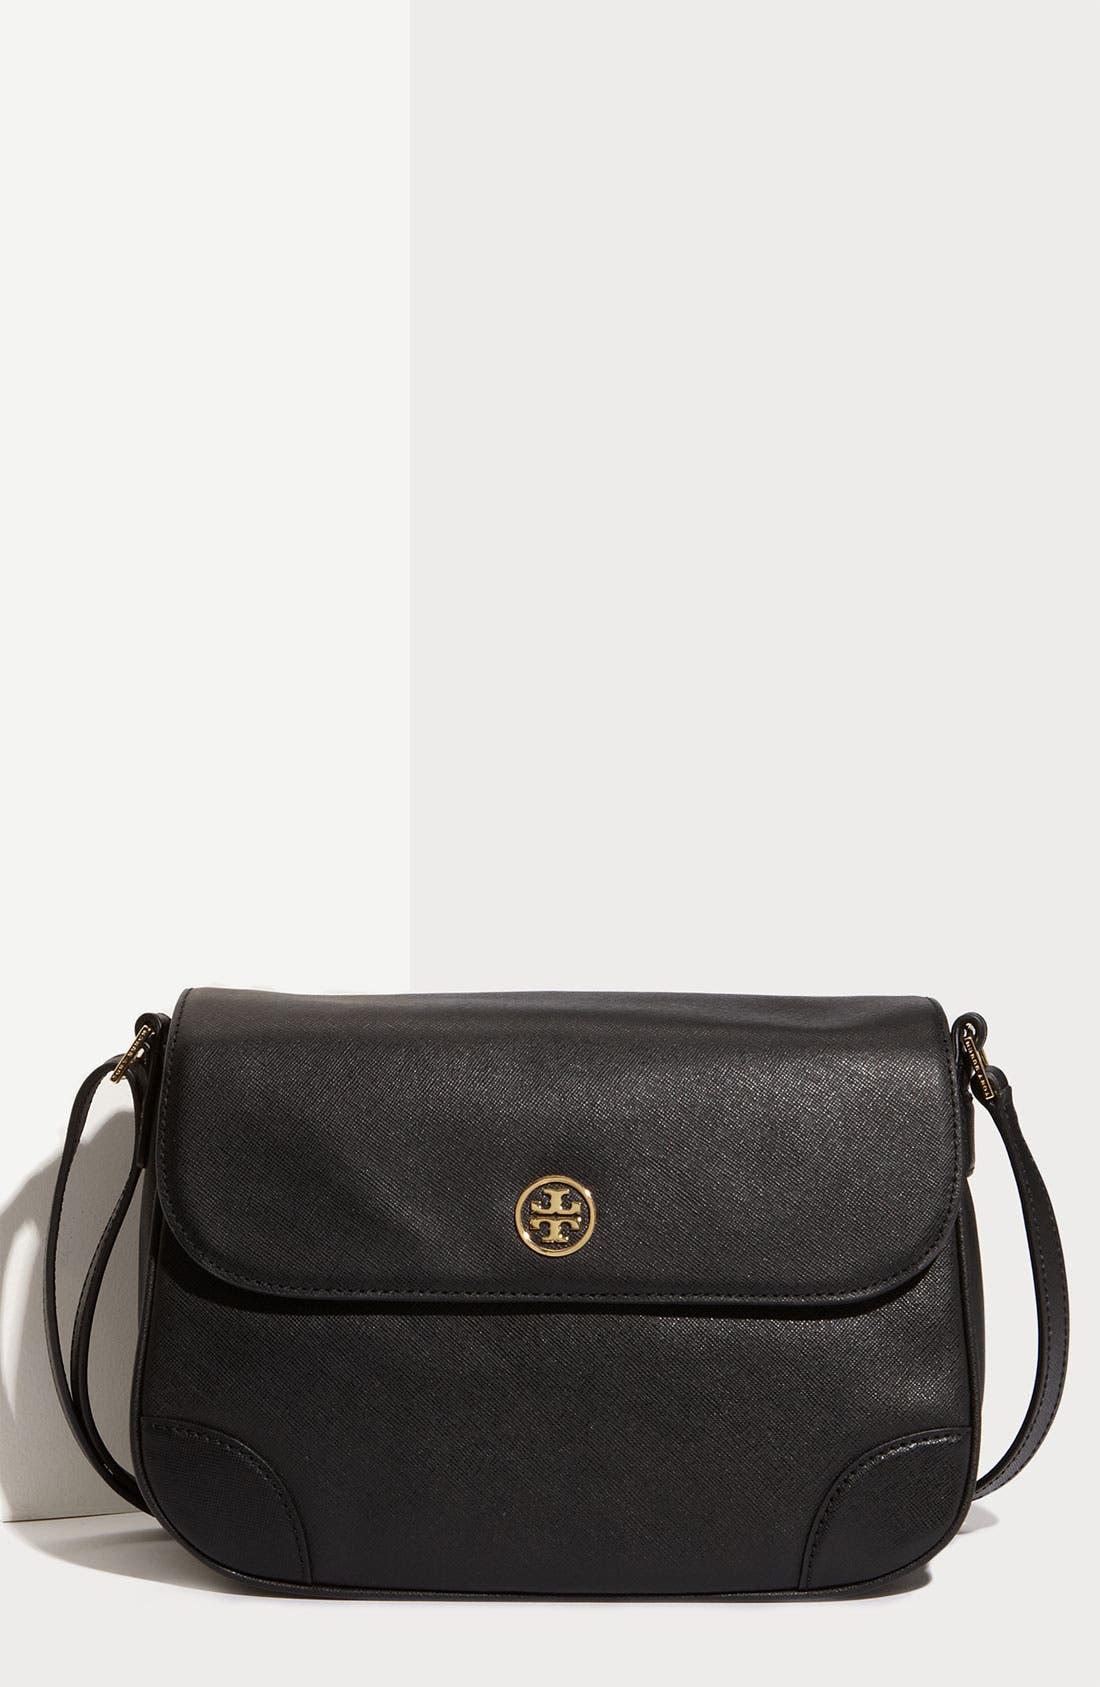 Main Image - Tory Burch 'Robinson' Leather Crossbody Bag